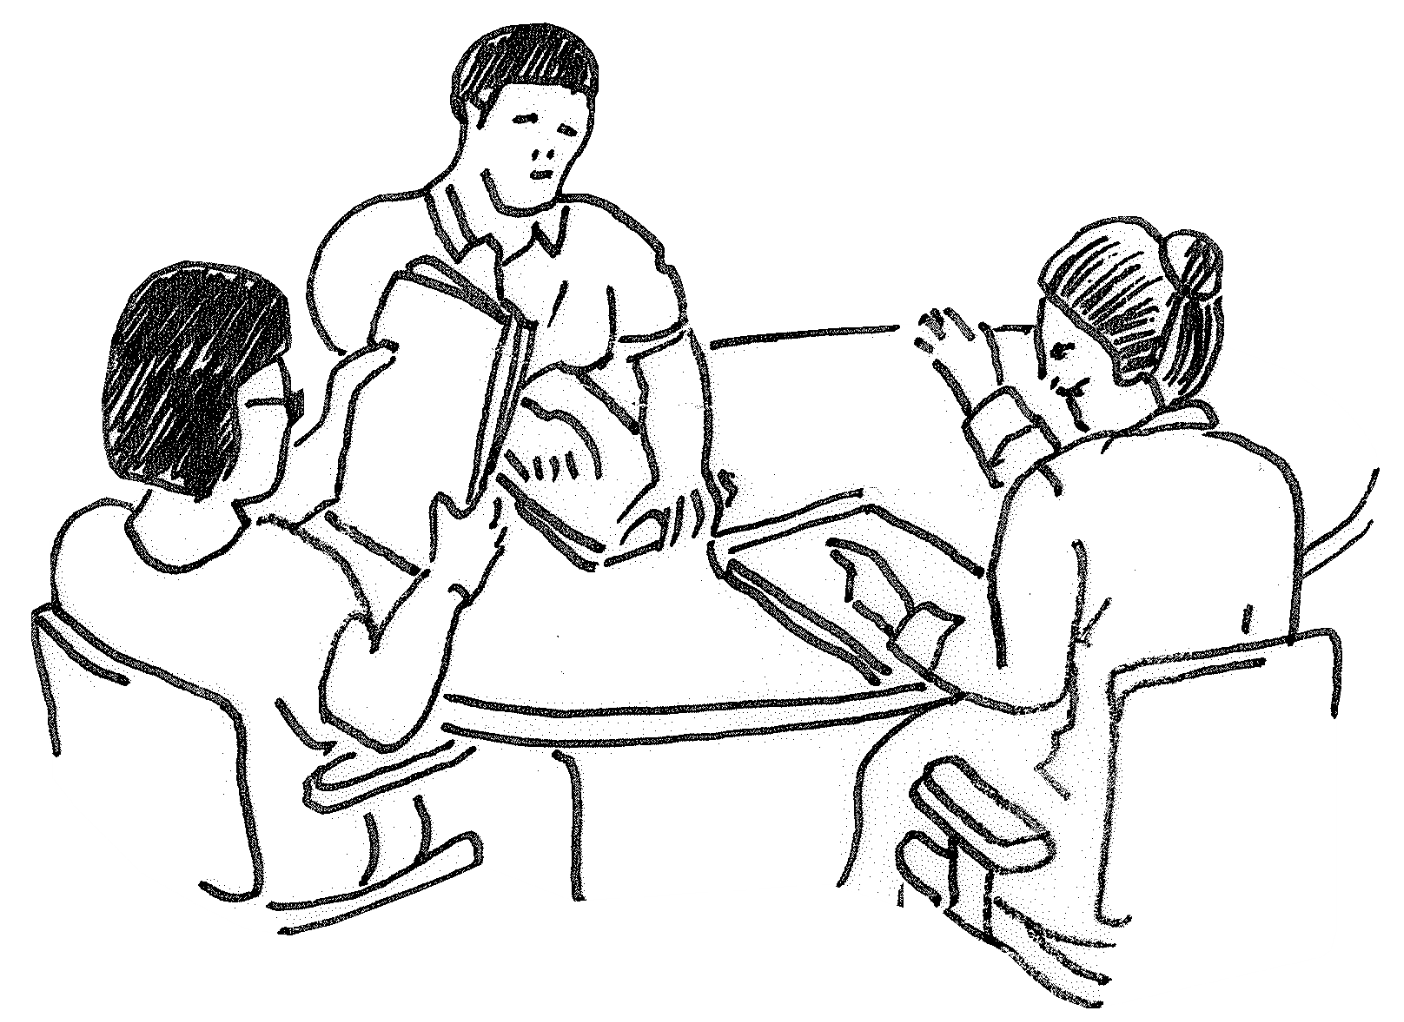 Irish Sign Language interpreting